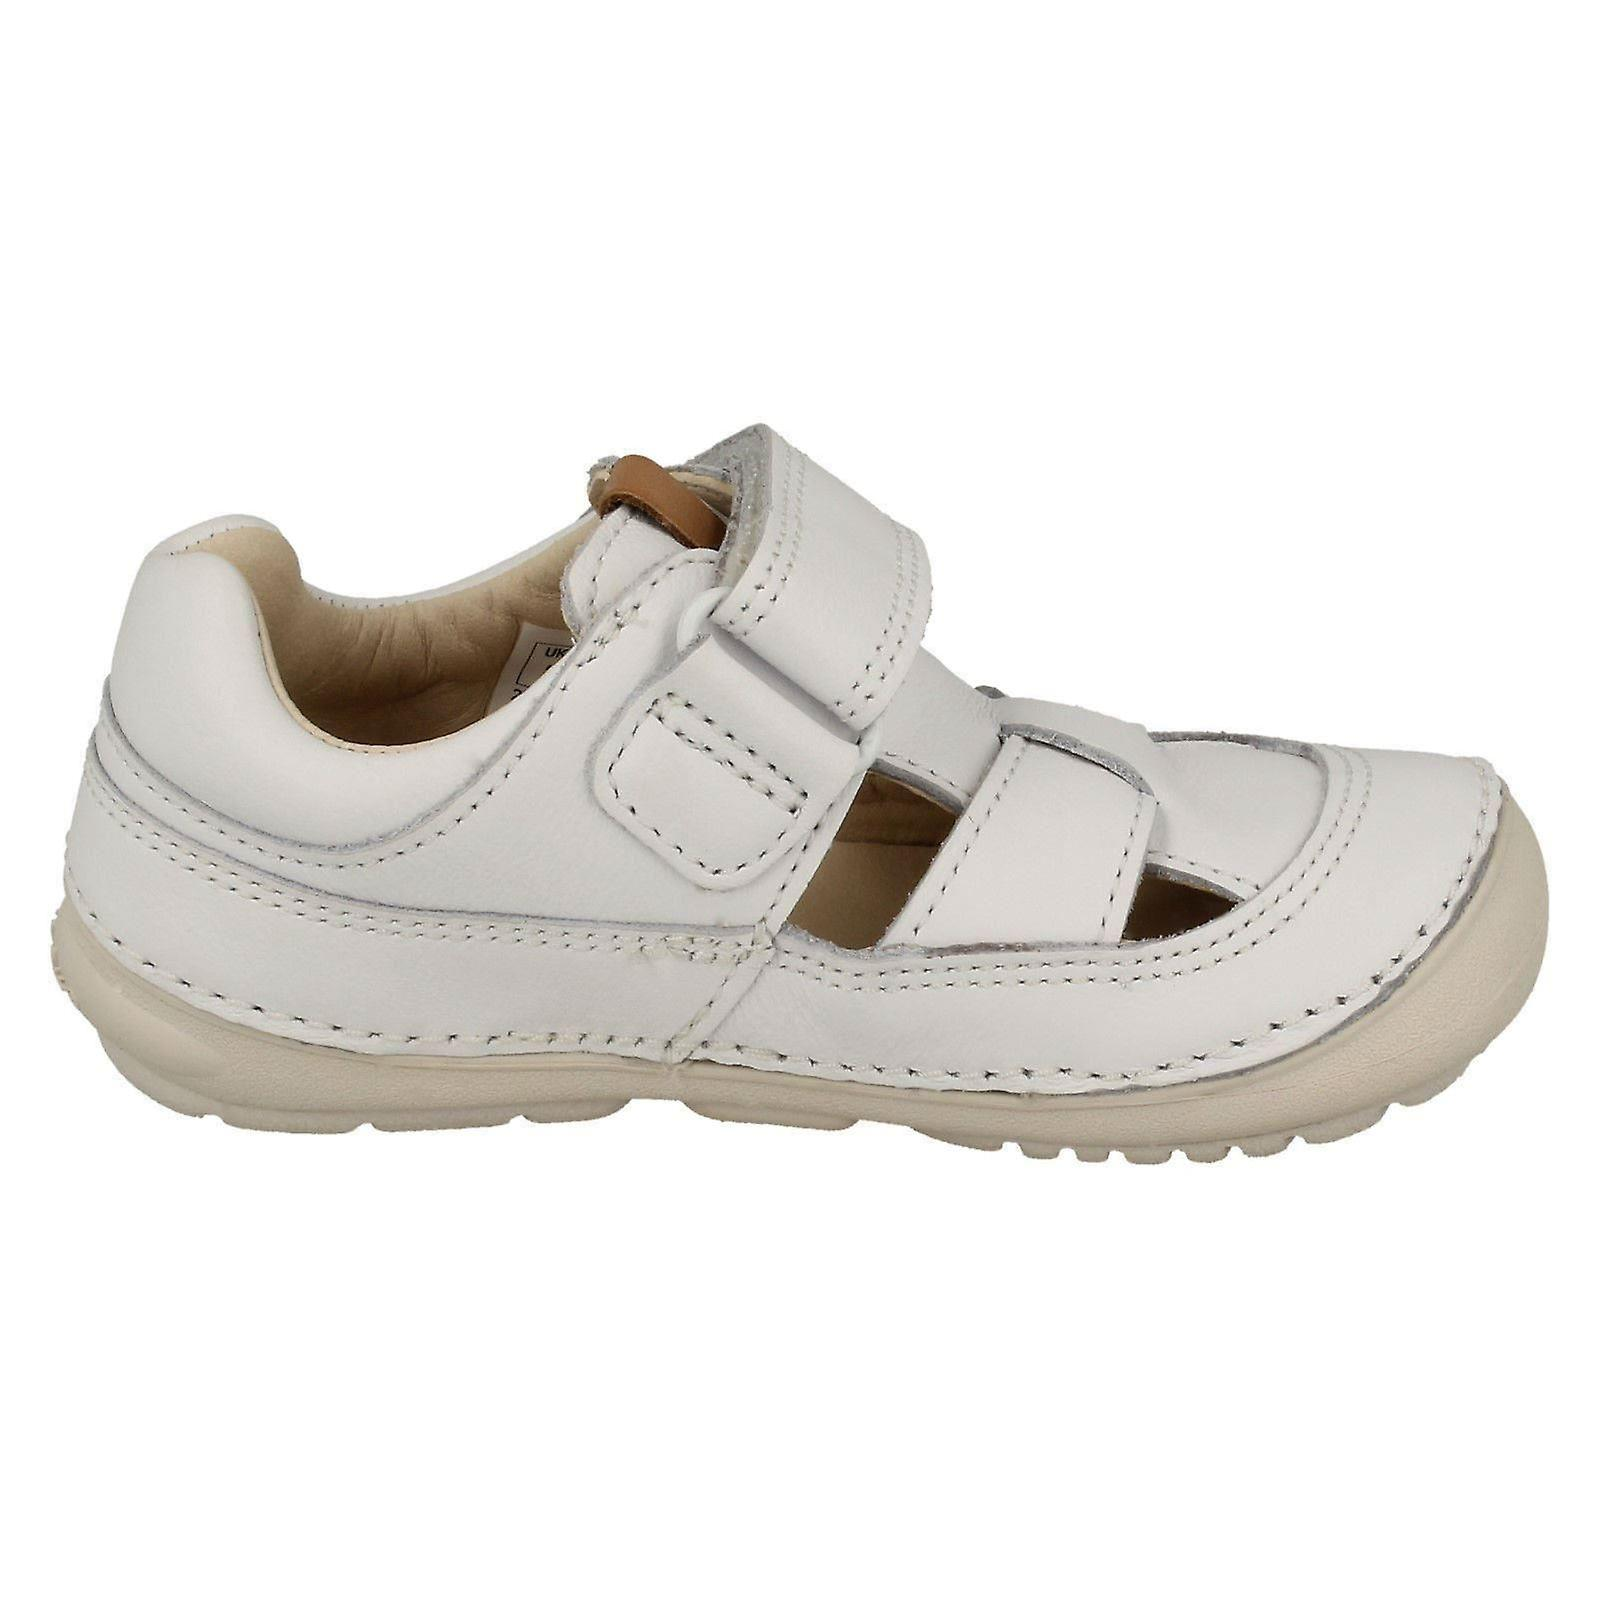 Mädchen Clarks Casual Schuhe sanft Wiese